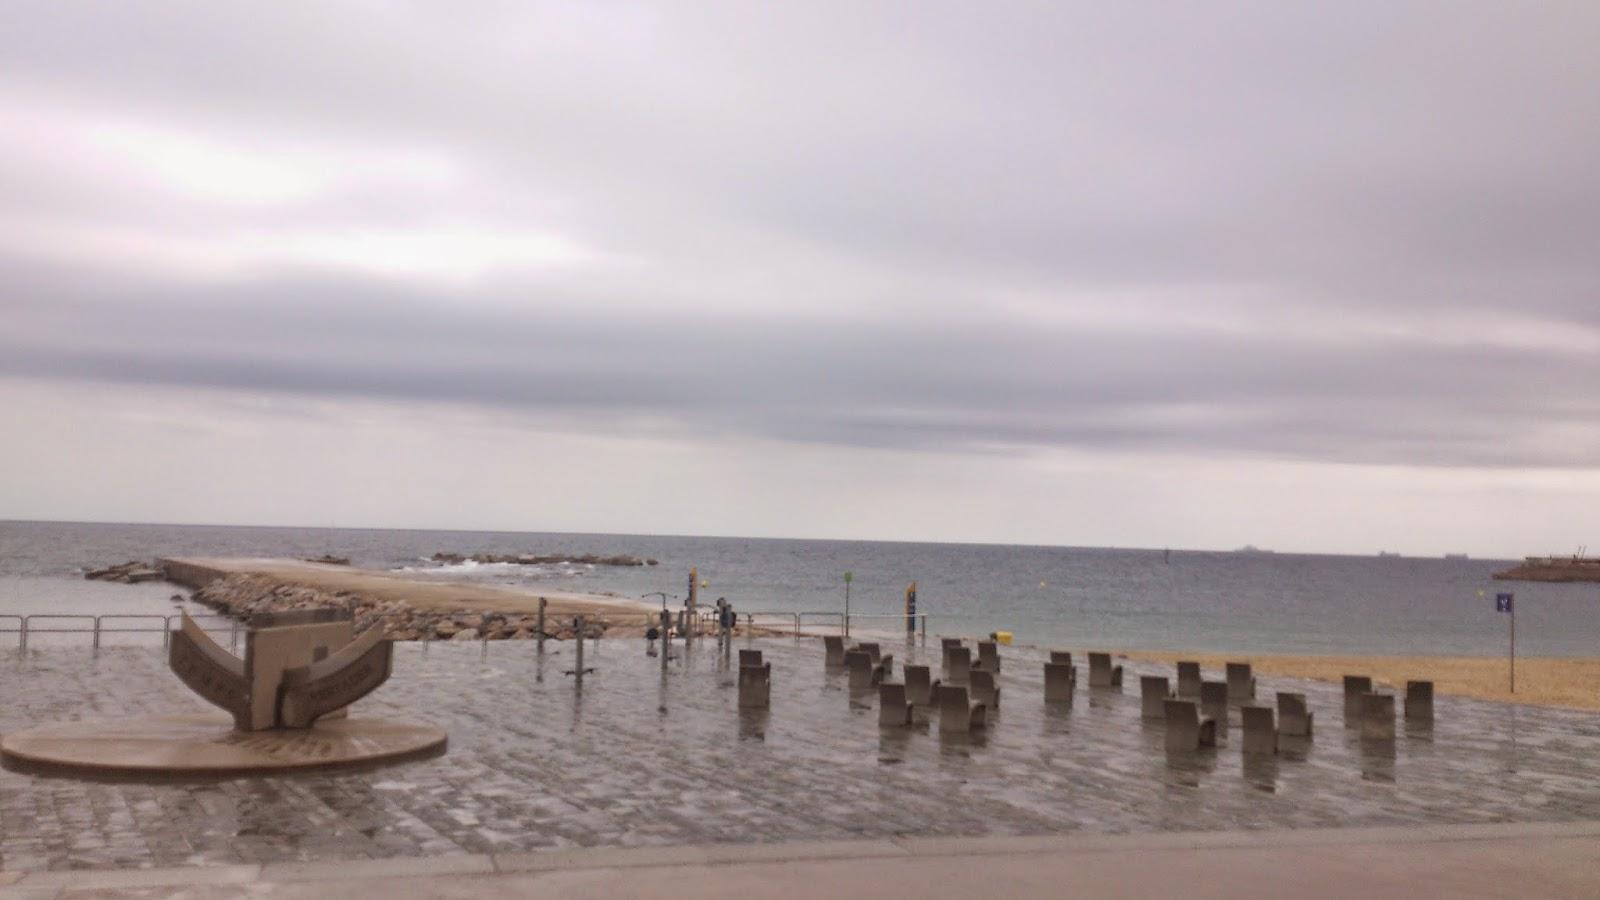 playa de la barceloneta lluvia